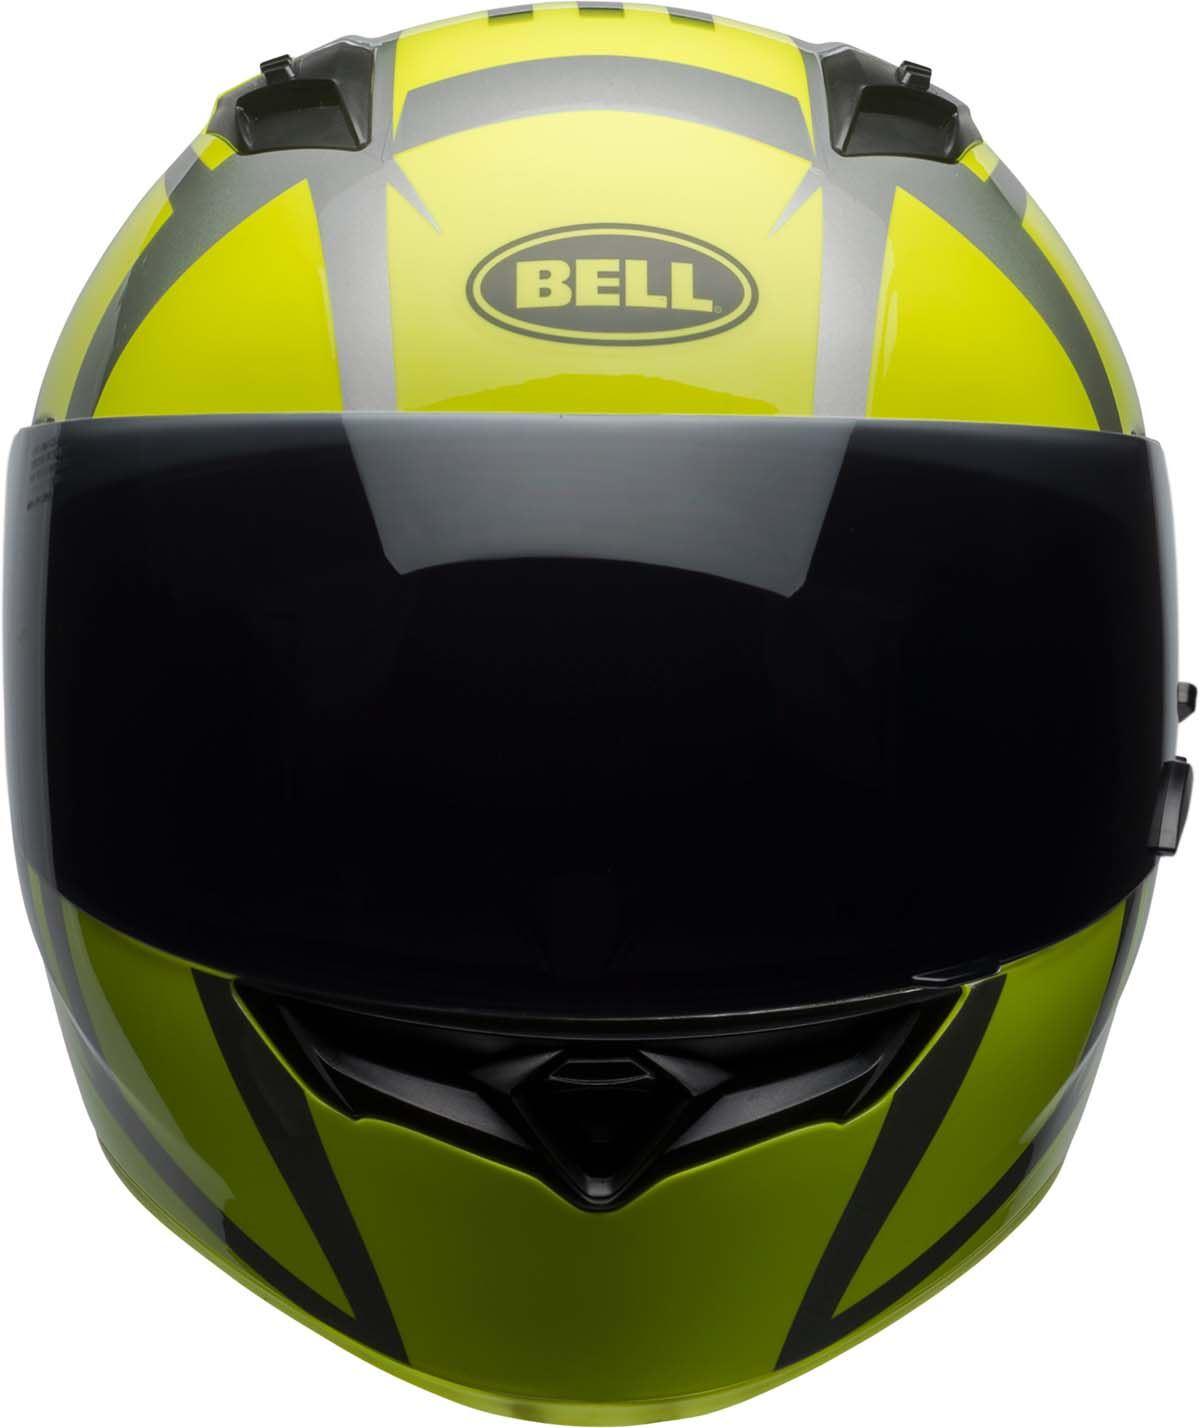 Bell-Qualifier-Helmet-Full-Face-Motorcycle-Clear-Shield-DOT-XS-3XL miniature 39